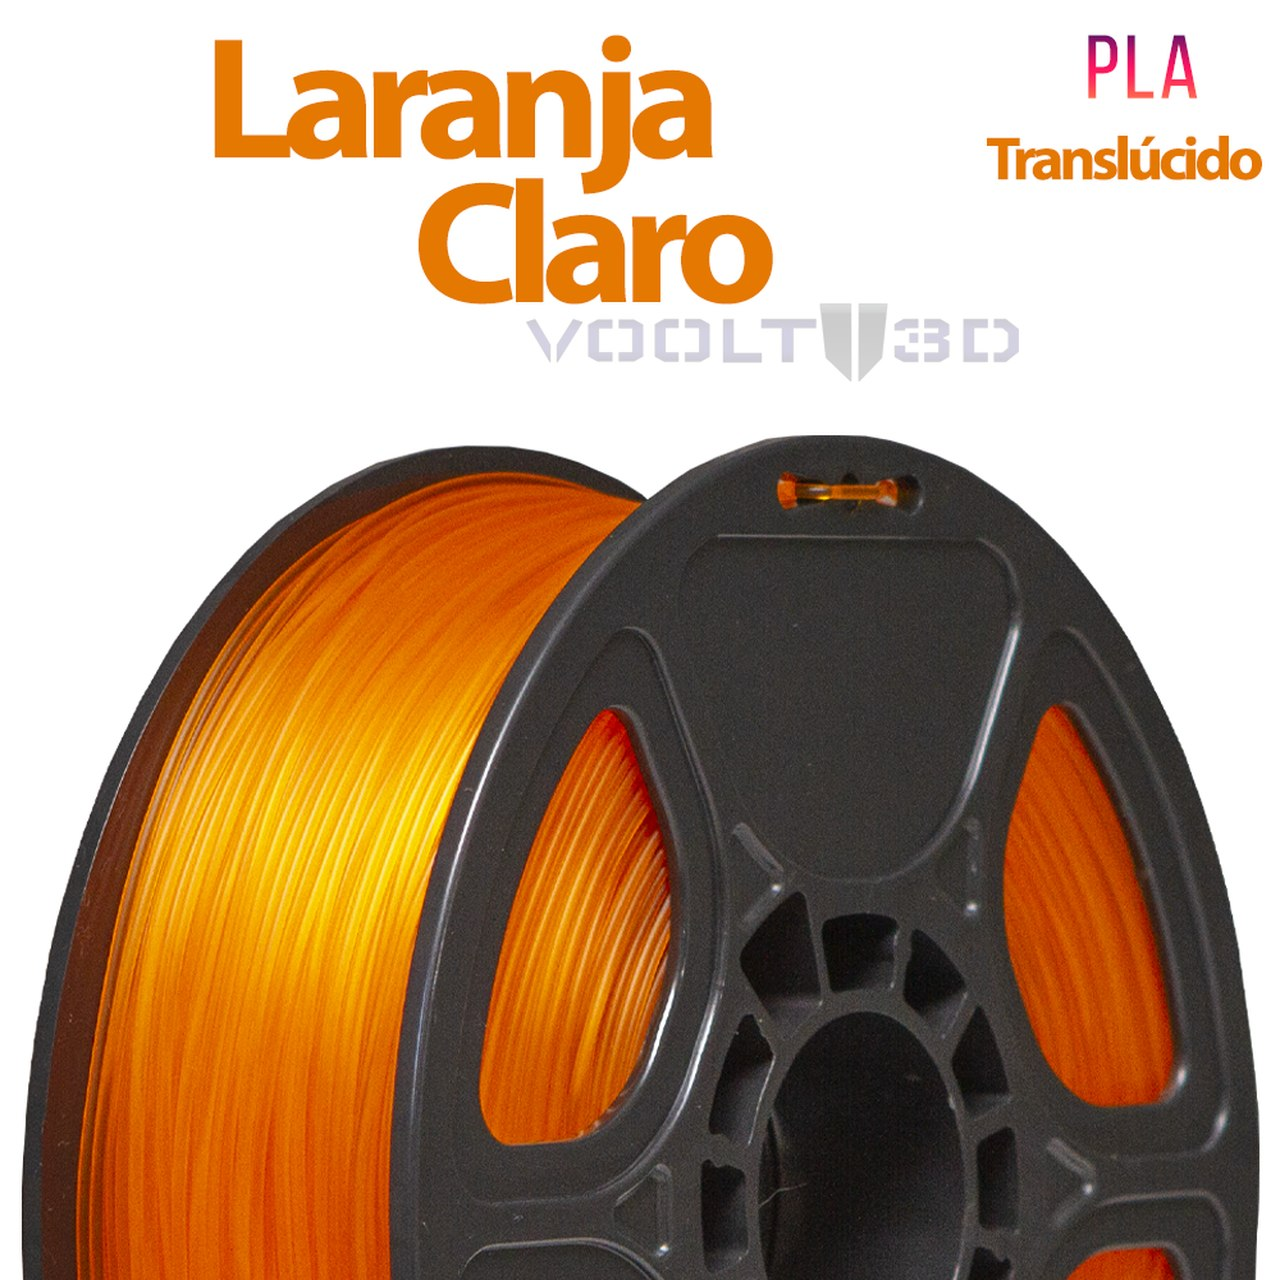 Filamento PLA - Laranja Claro Translúcido - Voolt - 1.75mm - 1kg